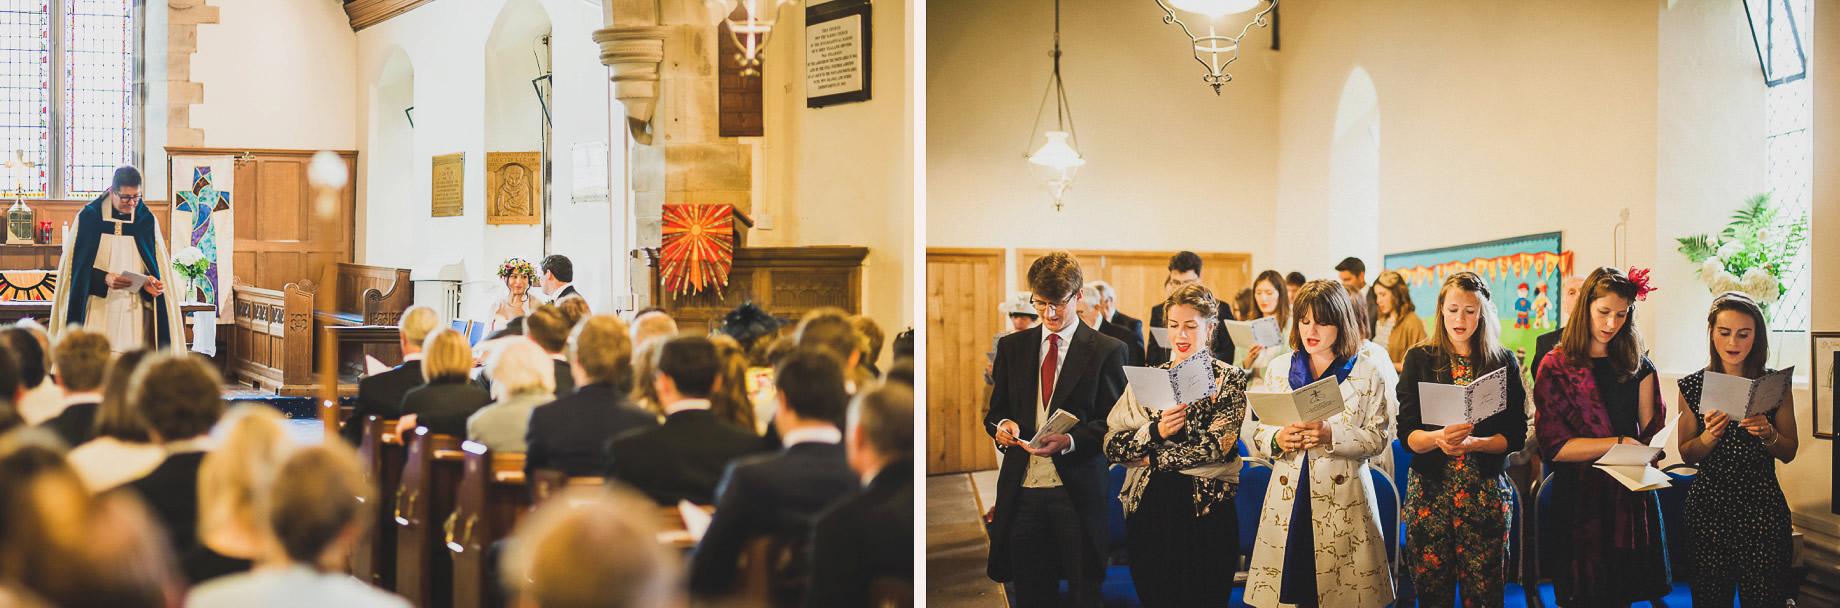 Julia and Simon's Wedding at Yealand Manor 065